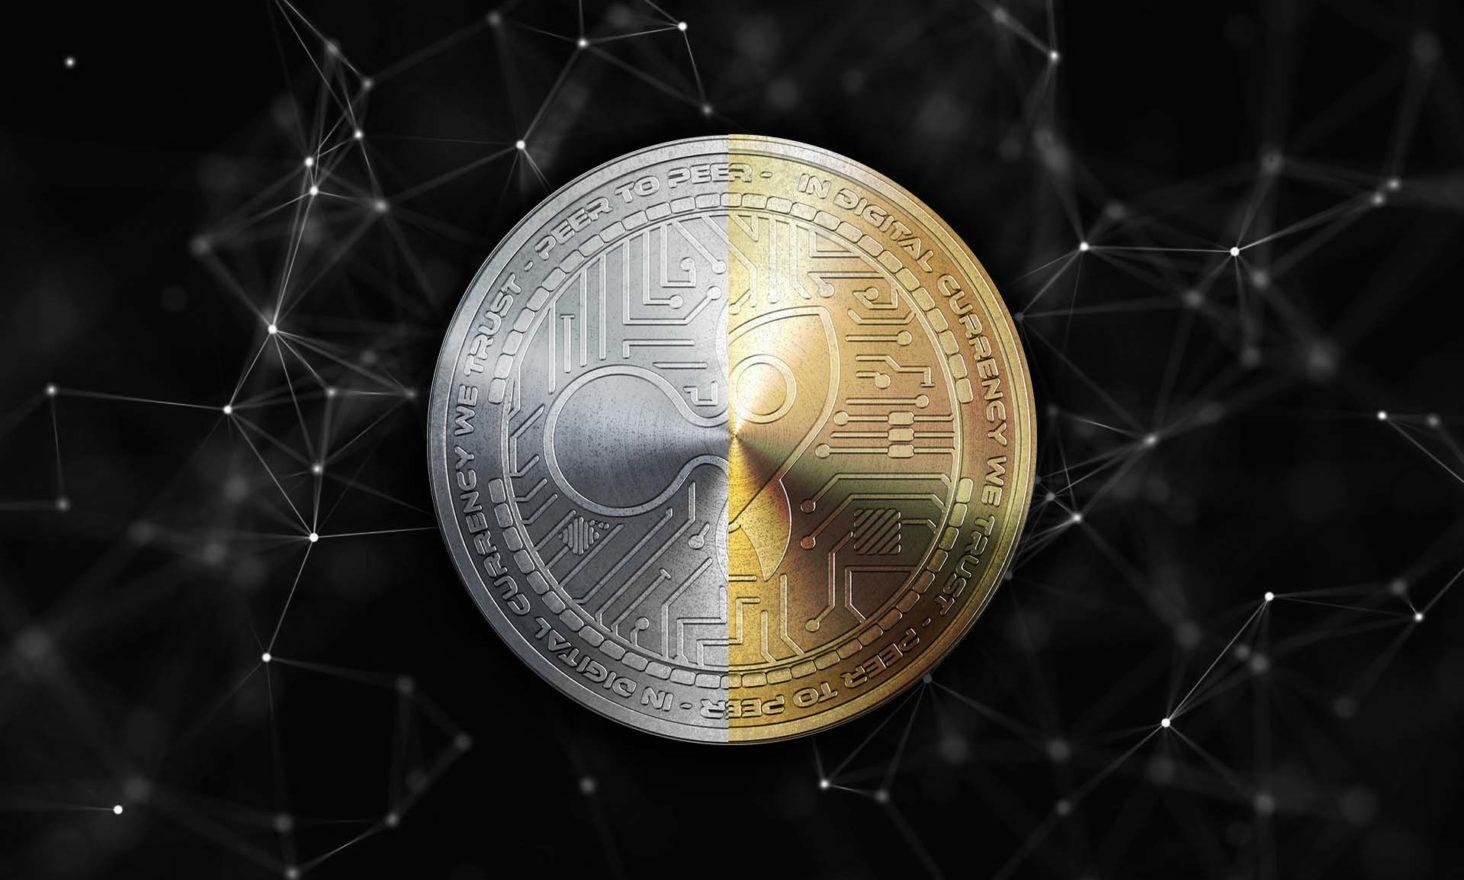 Ripple vs Stellar - Which Coin Will Win?